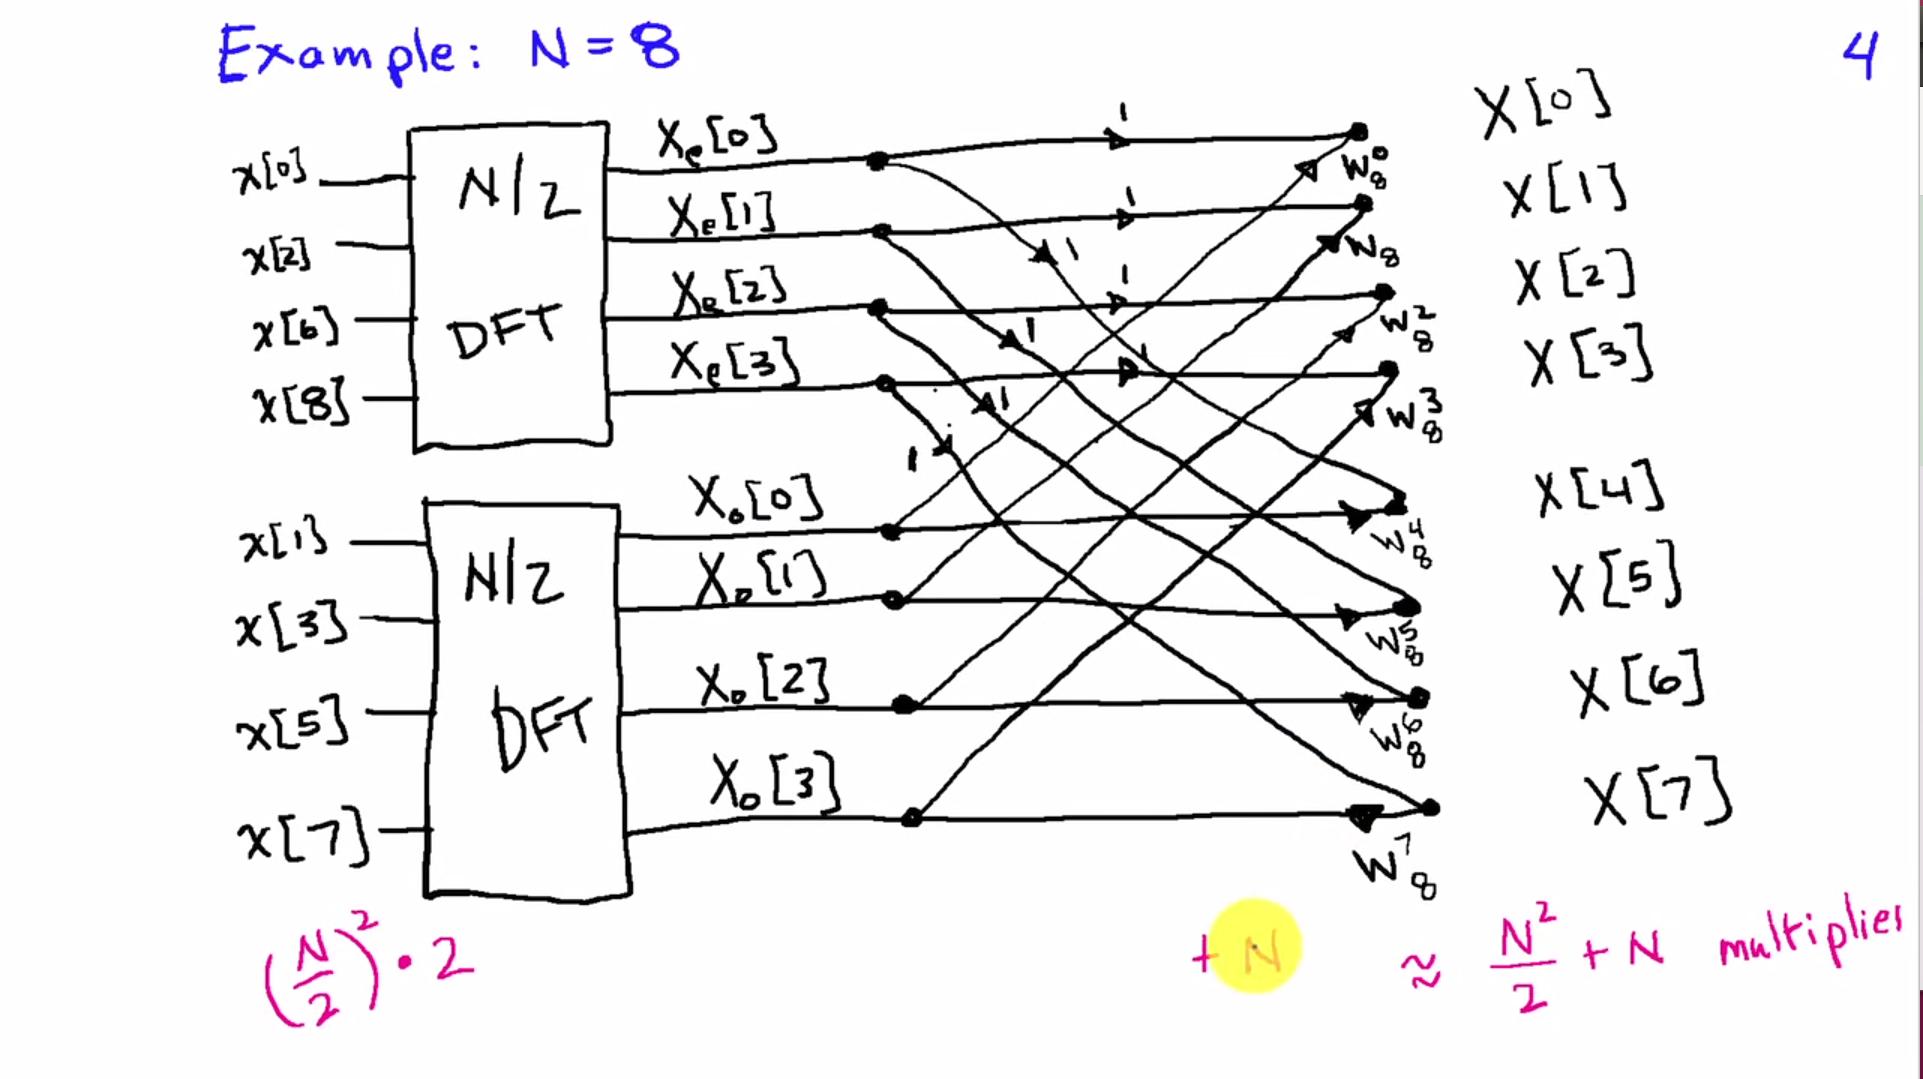 算法设计与分析[0002] Divide and Conquer——FFT(快速傅里叶变换